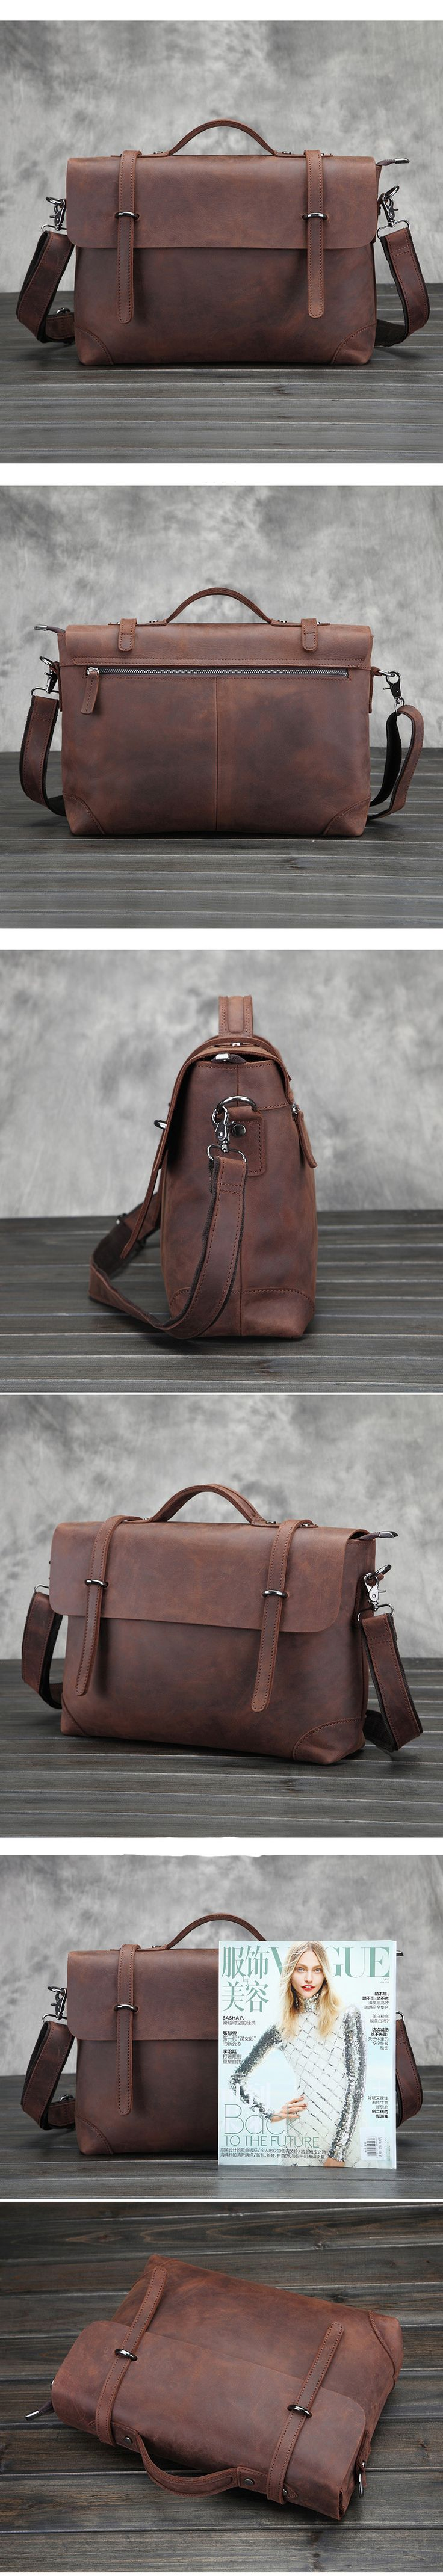 Will you find a bag you like at www.leathermessengerbags.top ?  Handmade Vintage Leather Briefcase/Backpack, Men Messenger Bag, Laptop Bag